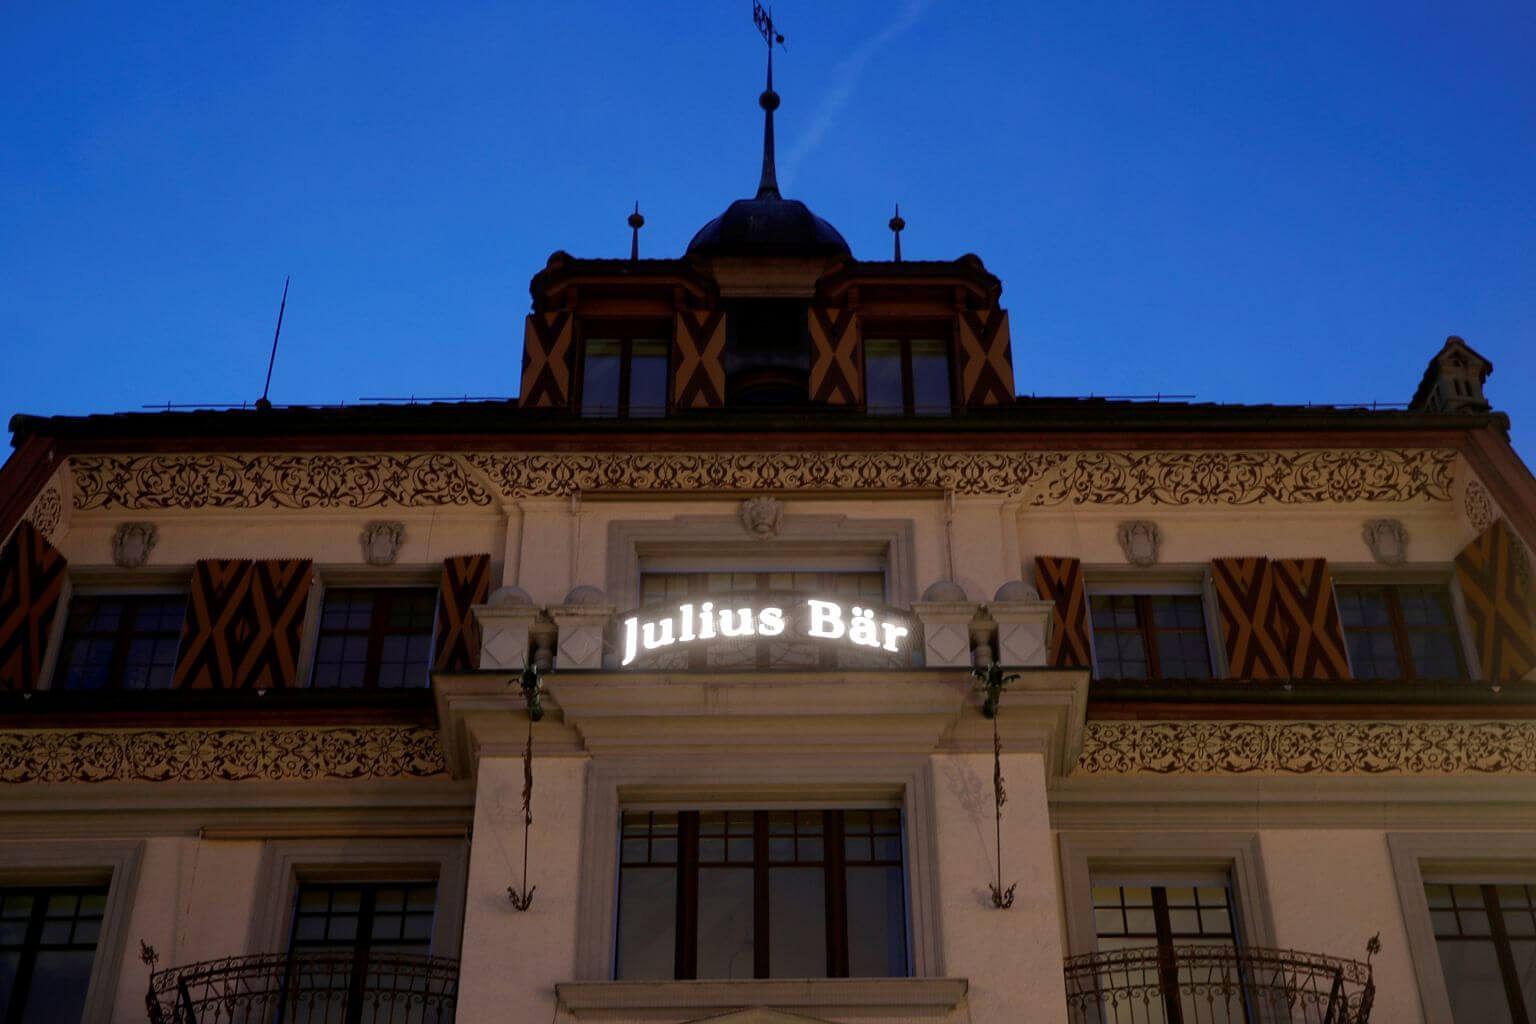 Julius Baer Names Philipp Rickenbacher Ceo To Replace Hodler